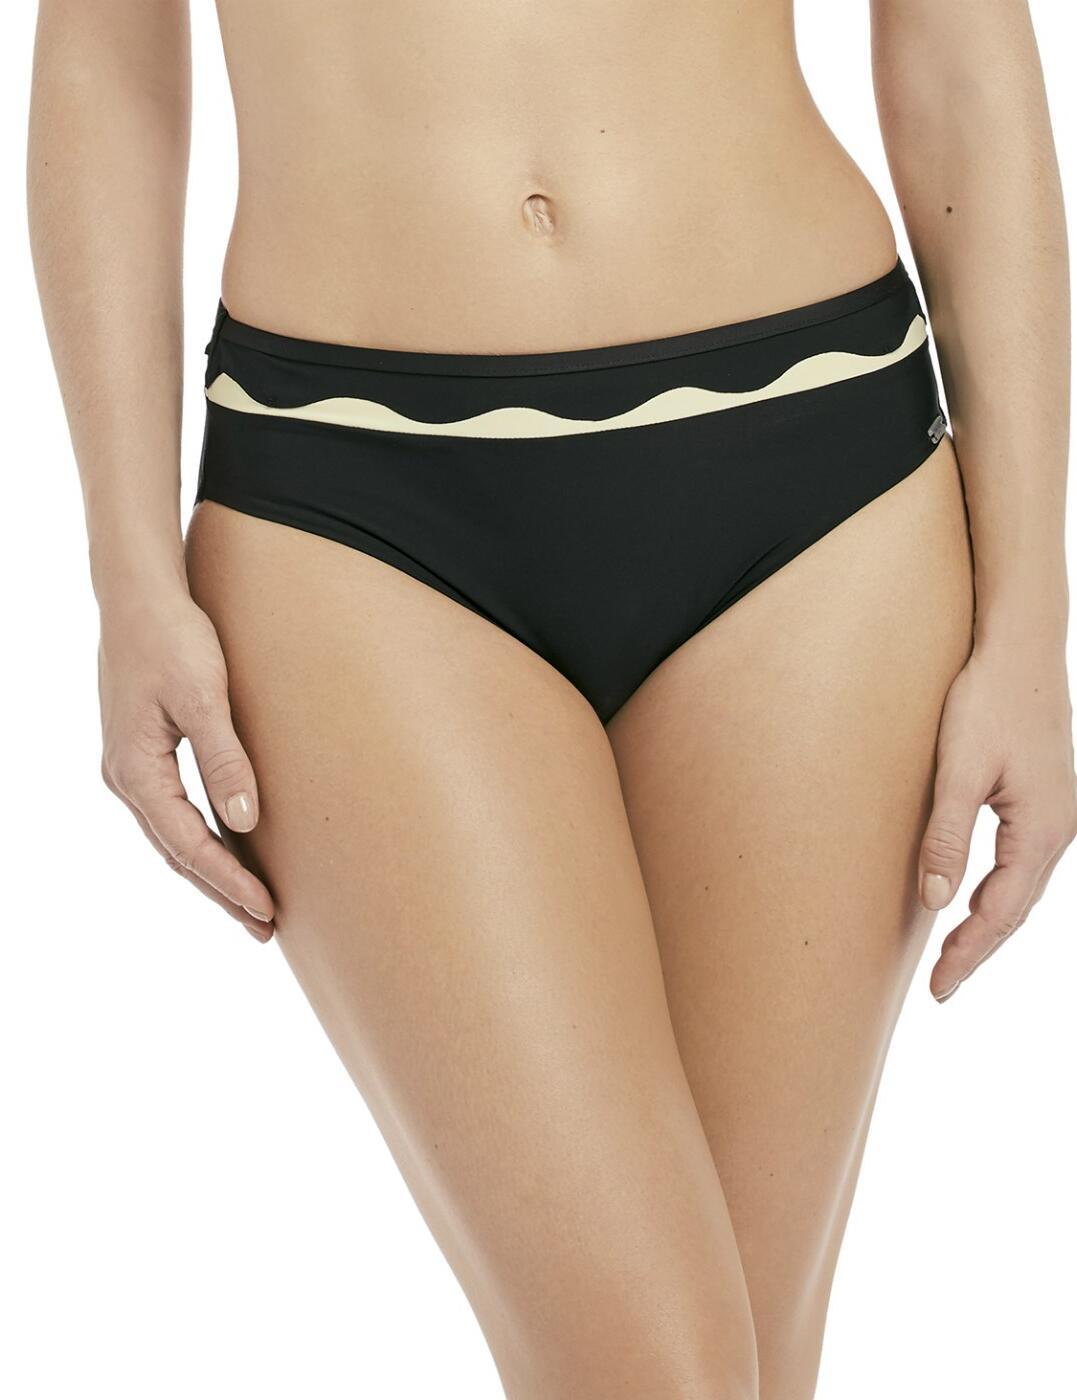 6234 Fantasie Sainte Maxime Mid Rise Bikini Brief - 6234 Black/Cream